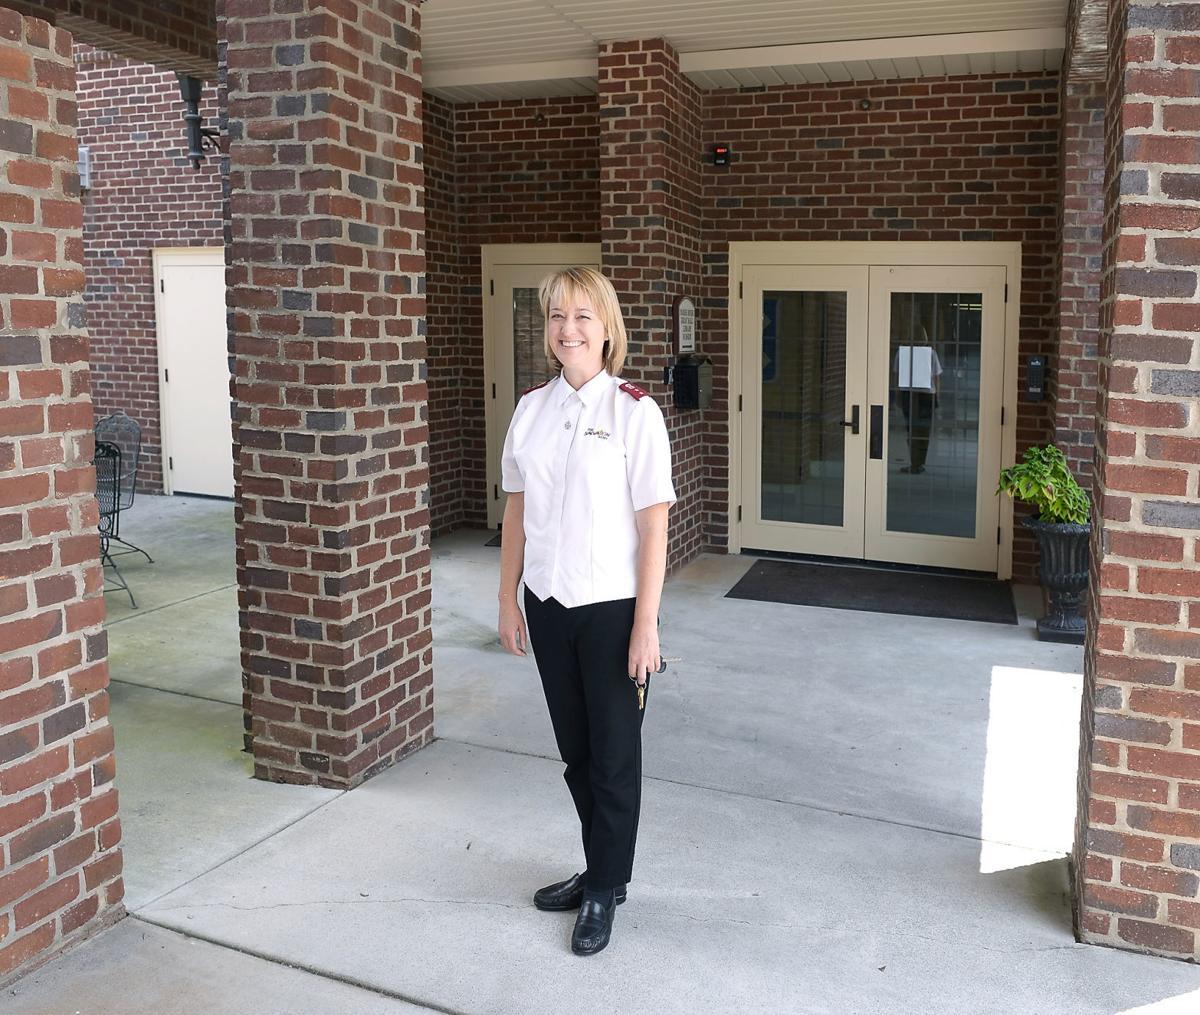 Salvation Army, Maureen Diffley